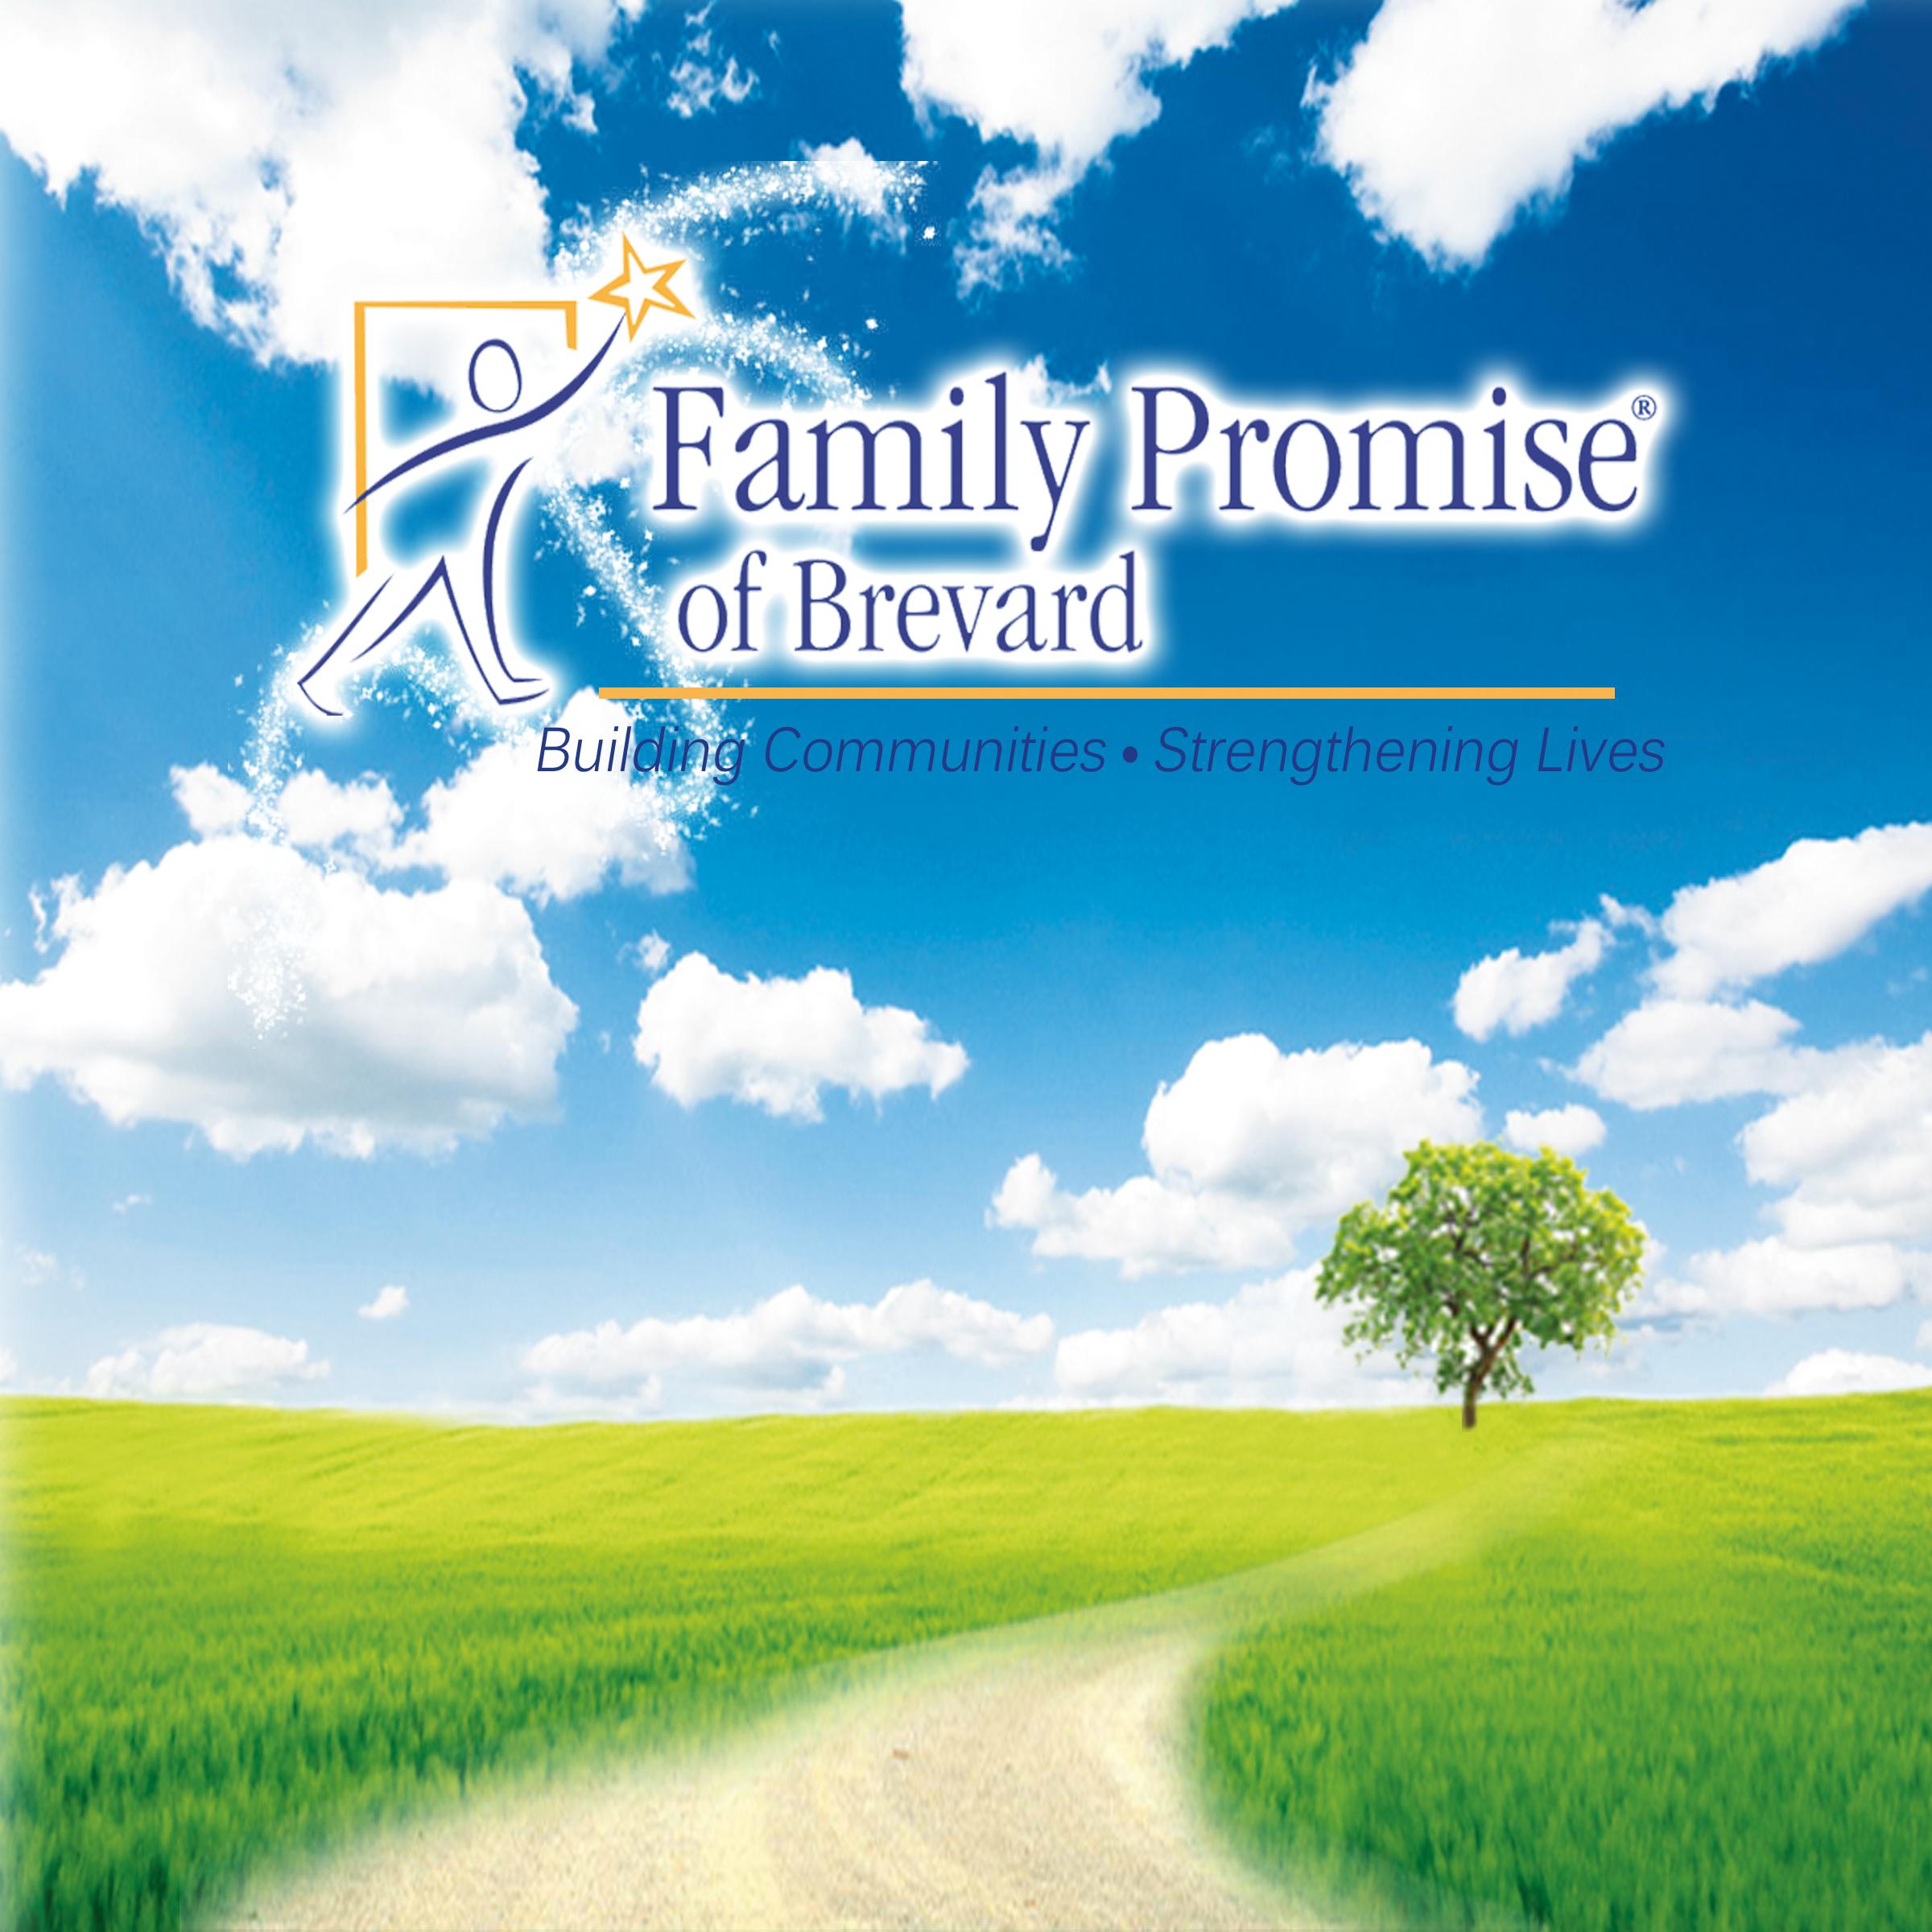 Family Promise of Brevard - Logowithimagelarge.jpg